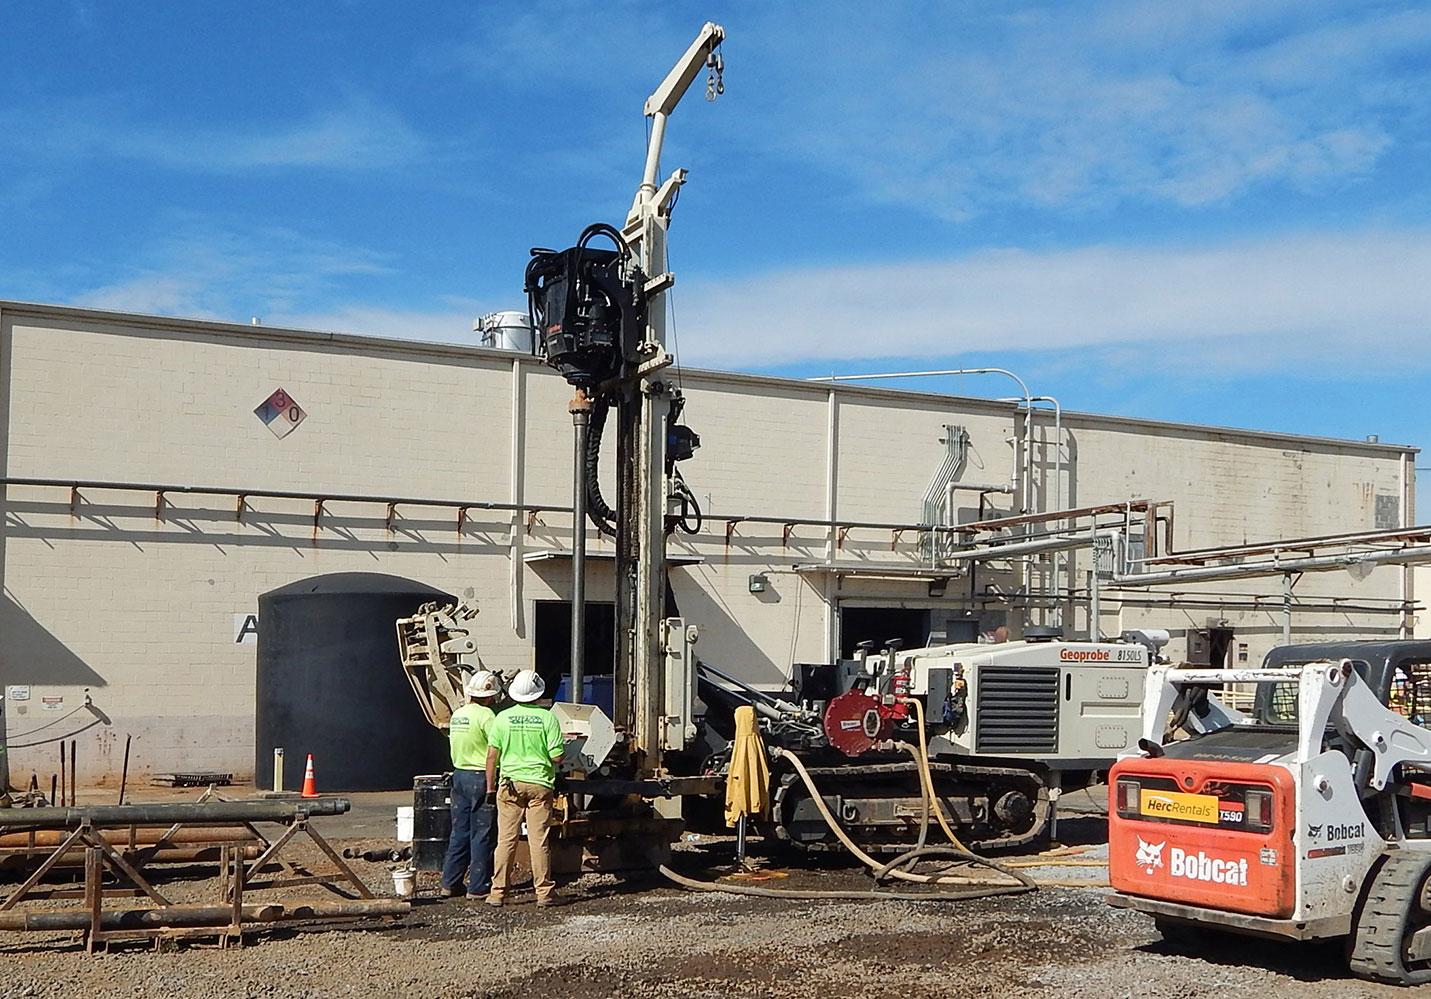 Roto-Sonic Drilling | SAEDACCO - Environmental Drilling and